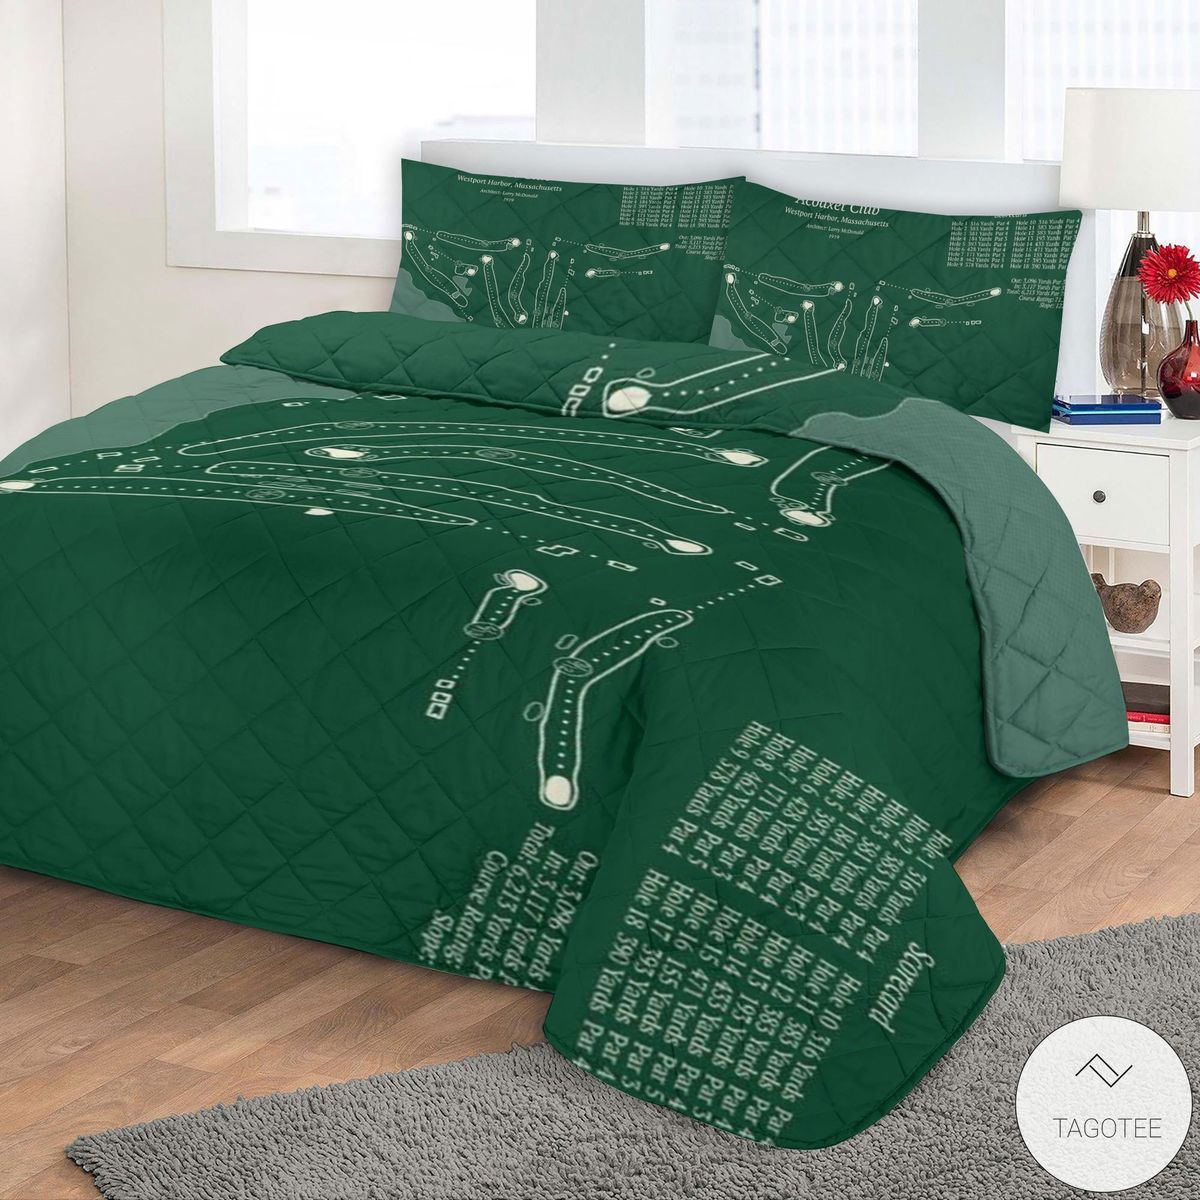 Acoaxet Club Map 3D Quilt Bedding Setz